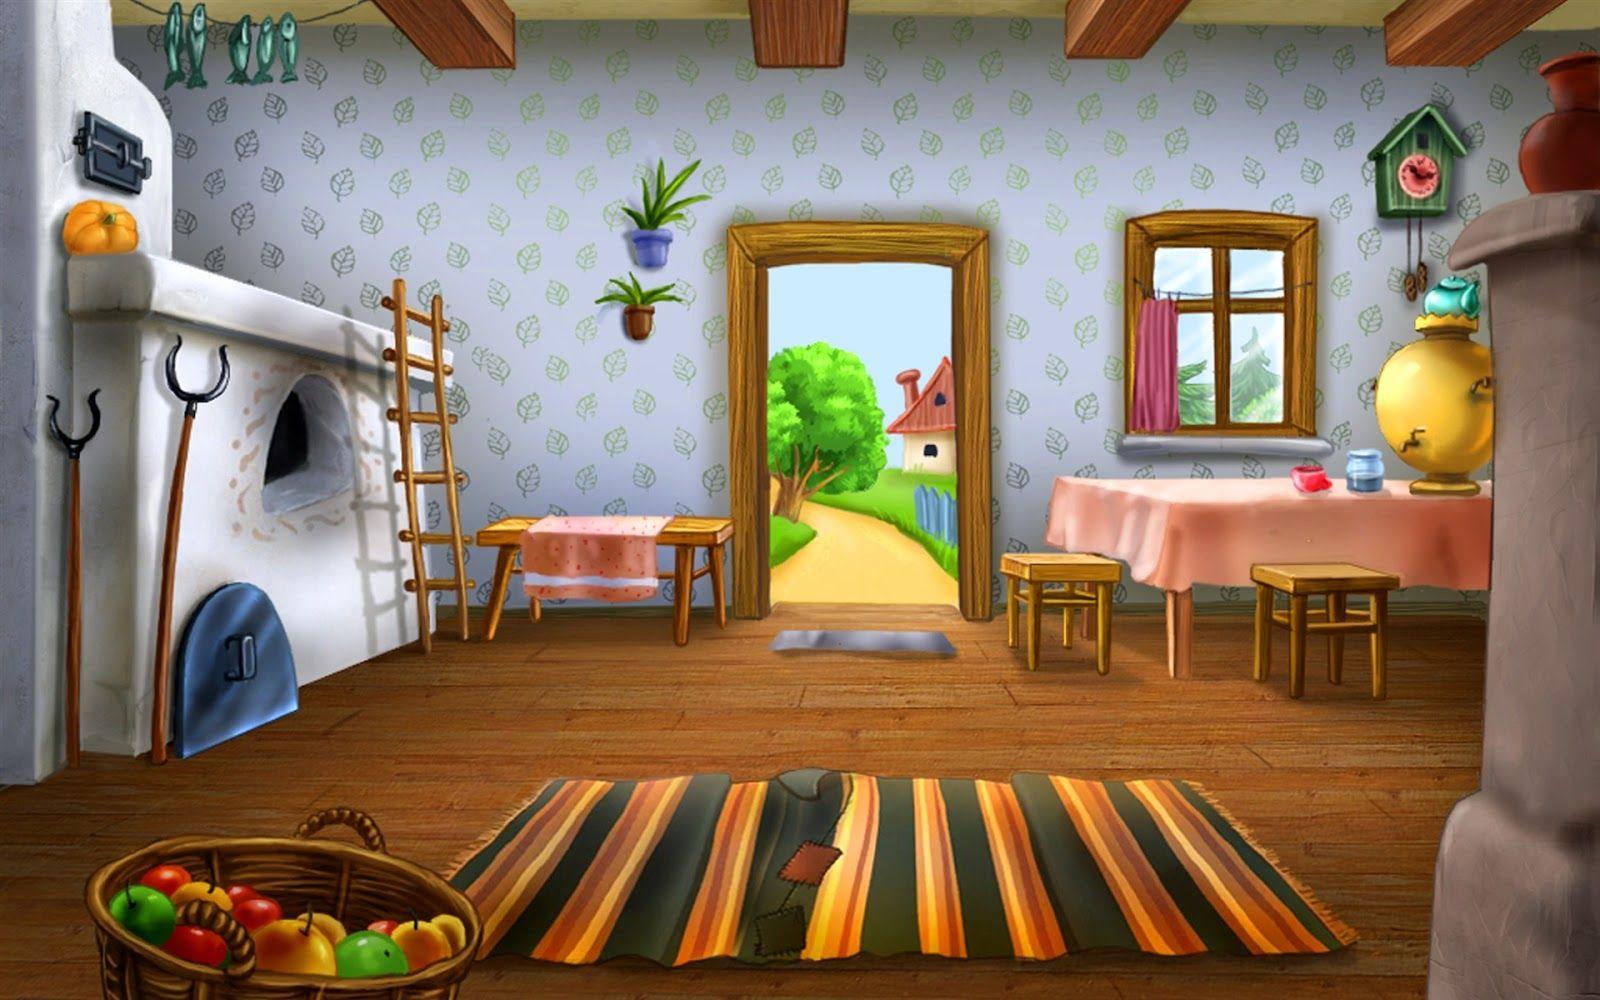 Image Result For Inside The Cottage Cartoon Home Wallpaper Artistic Wallpaper Decor